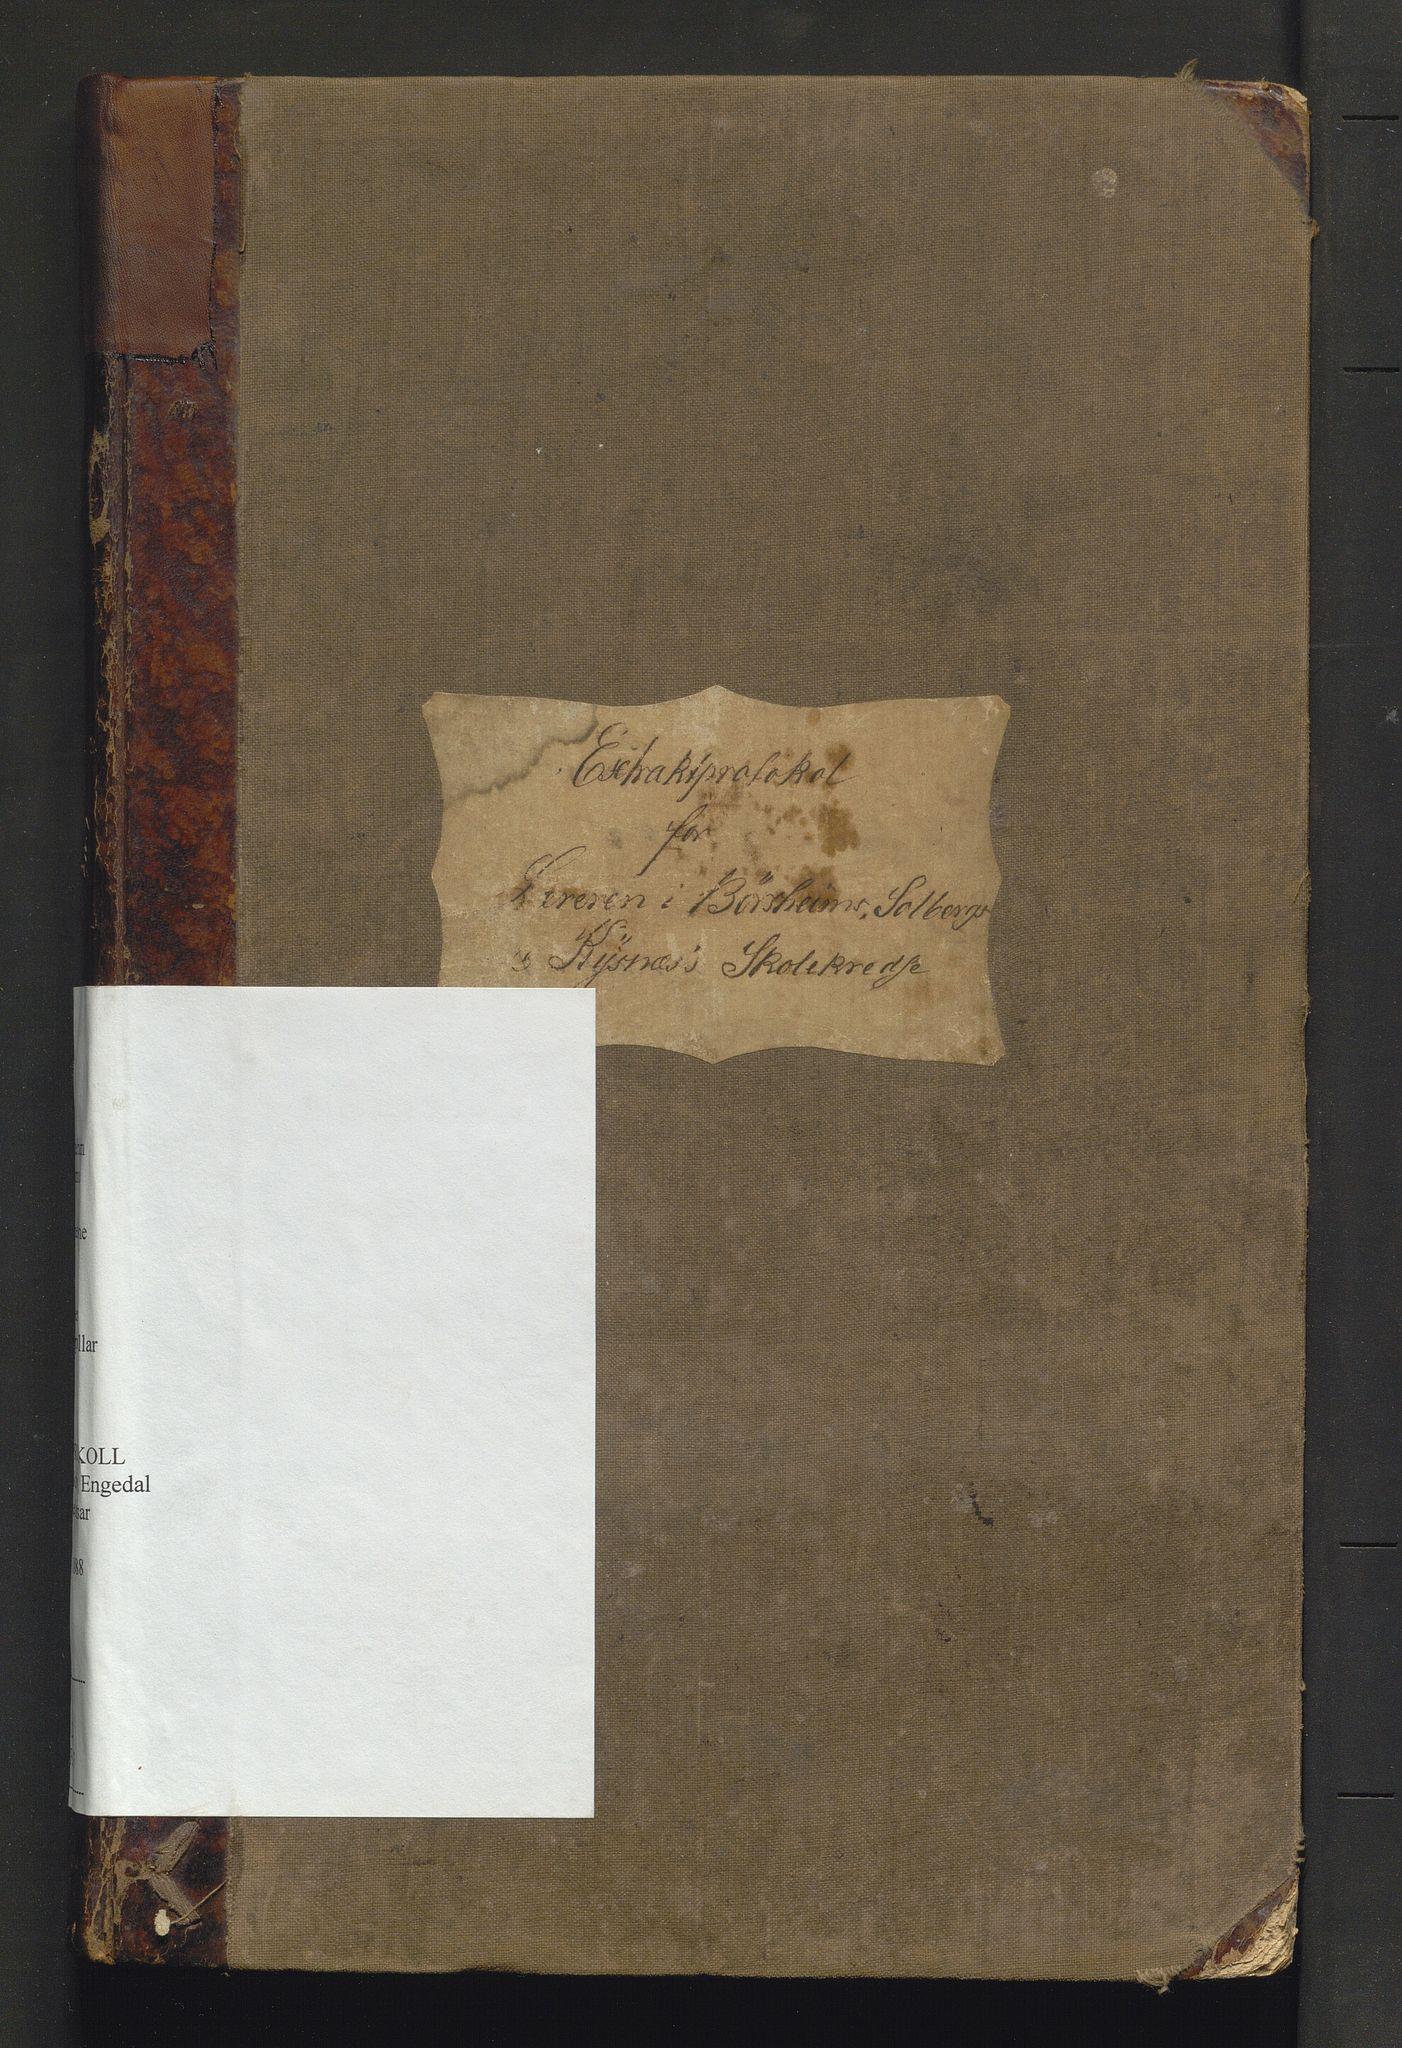 IKAH, Strandebarm kommune. Barneskulane, F/Fa/L0003: Skuleprotokoll for Børsheim, Solberg, Engedal og Kysnes krinsar, 1873-1888